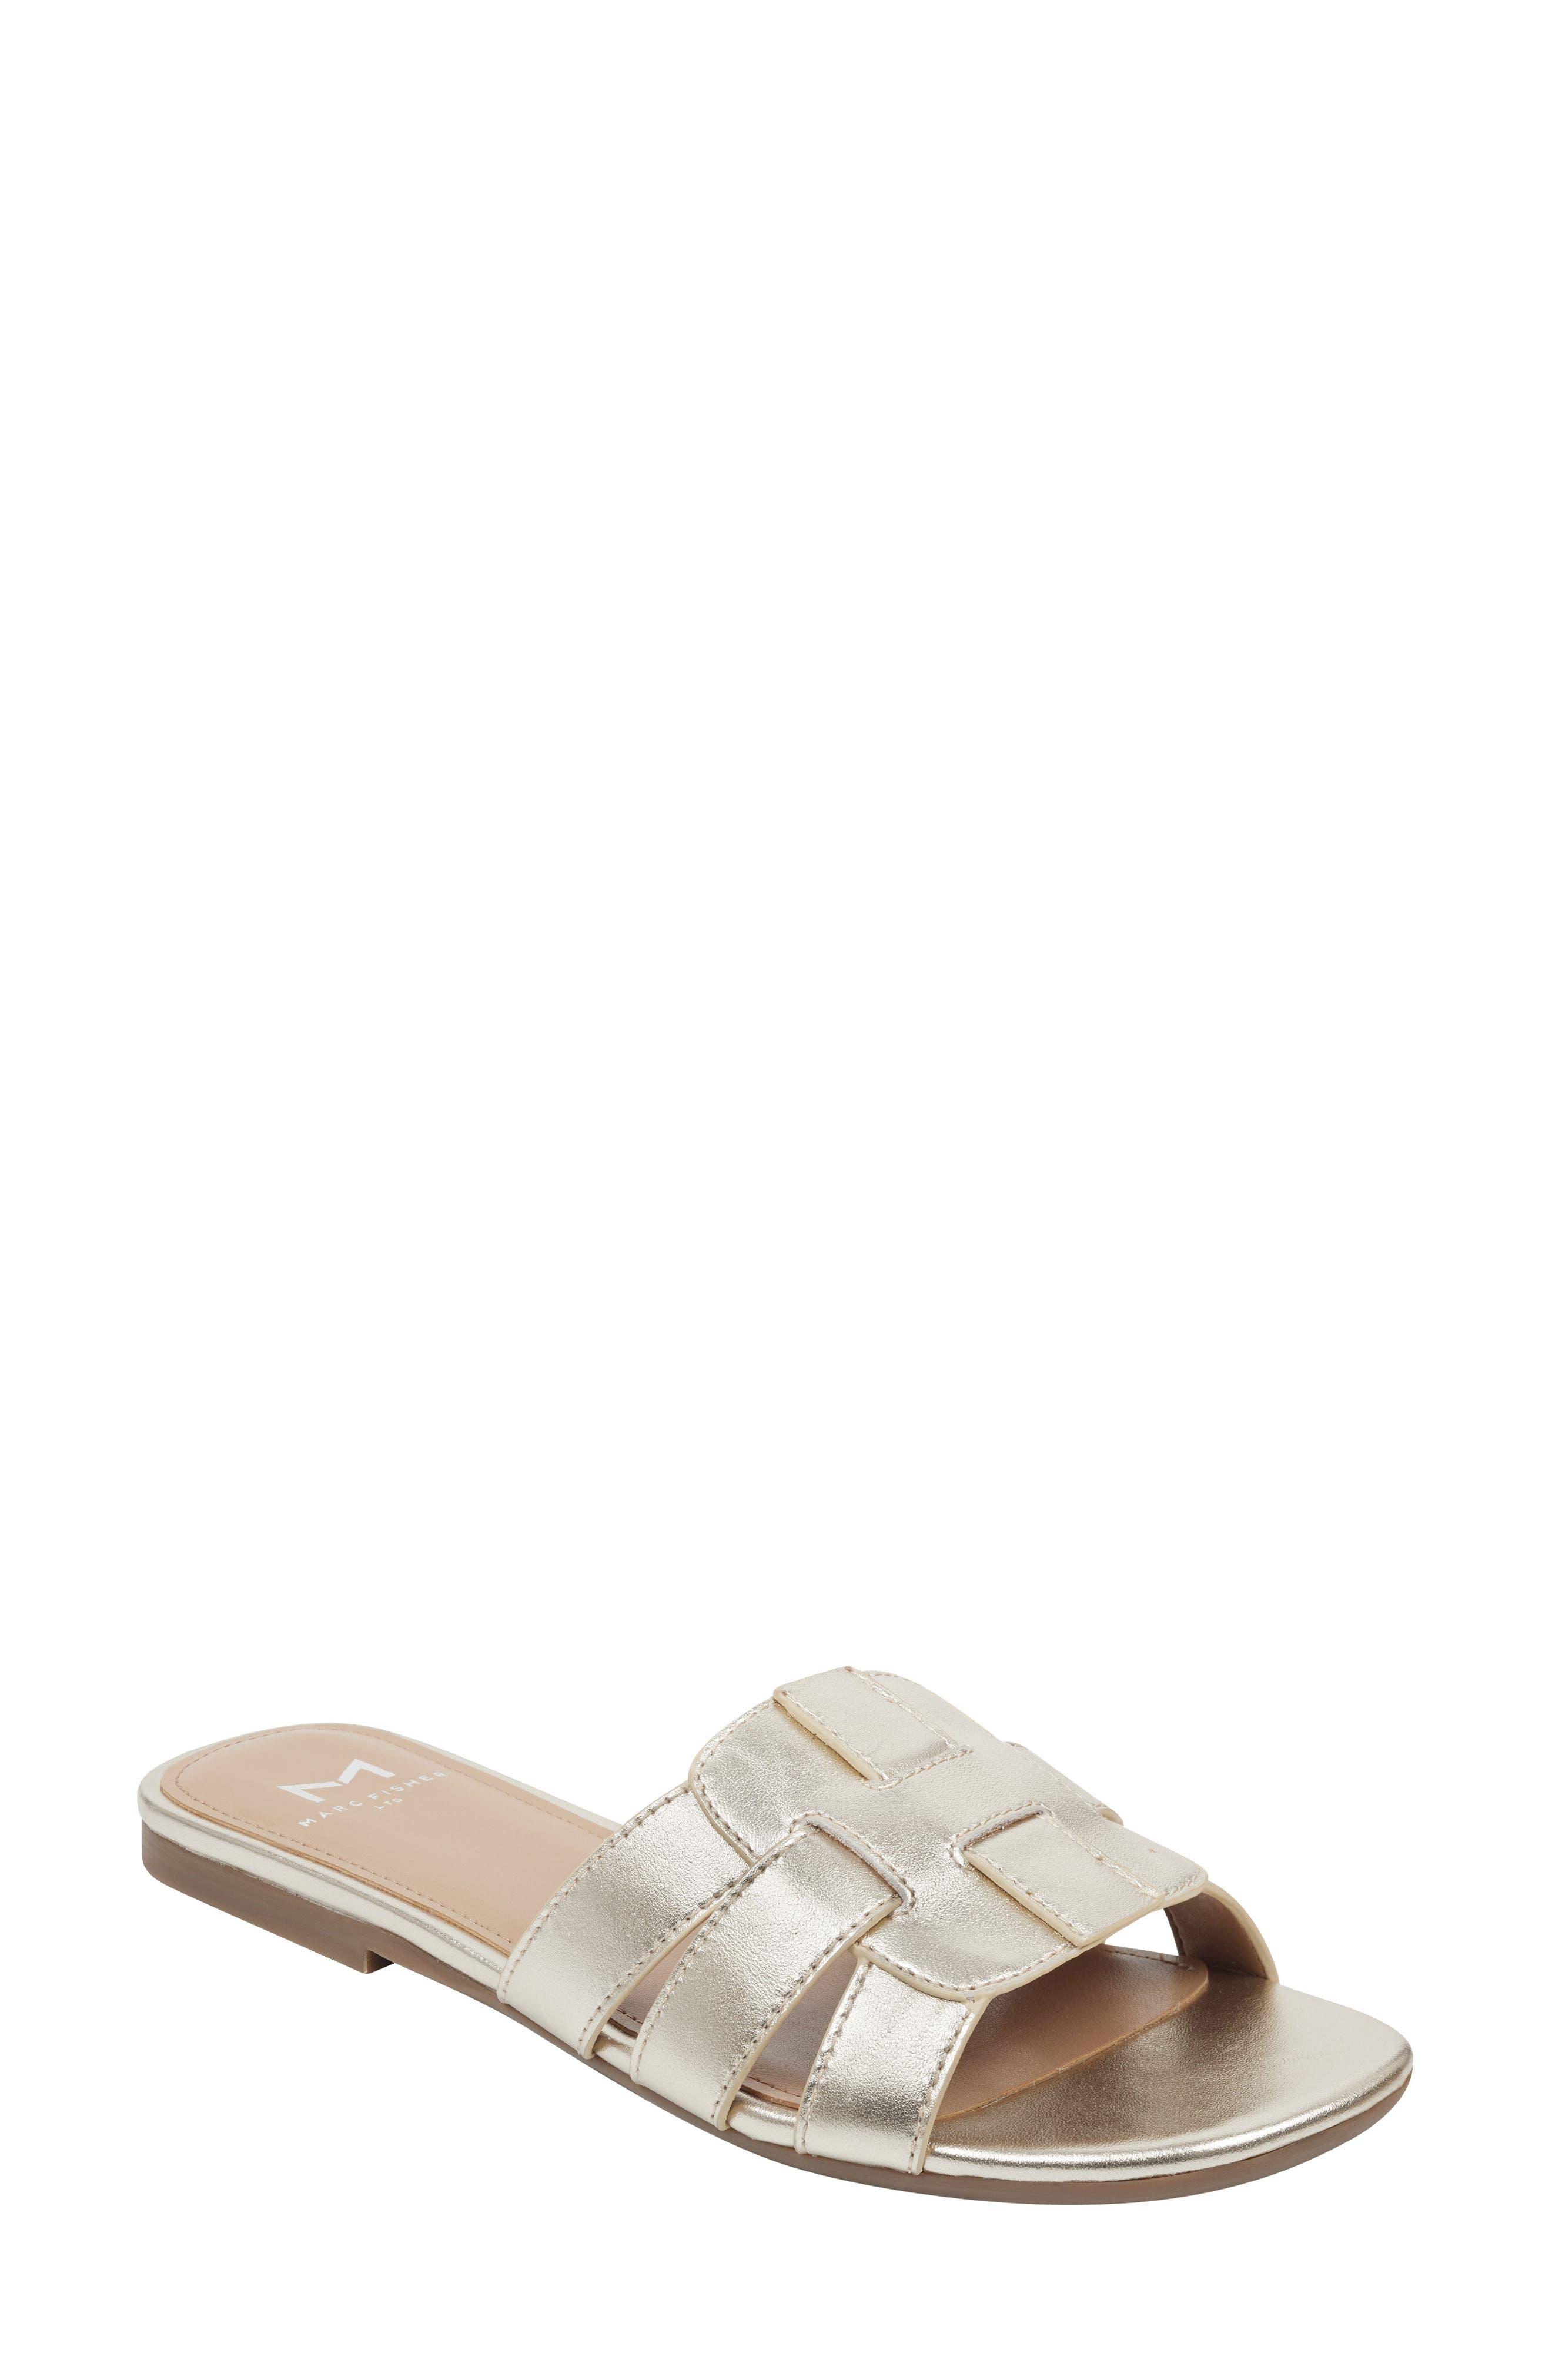 Marc Fisher Ltd Kayli Slide Sandal- Metallic